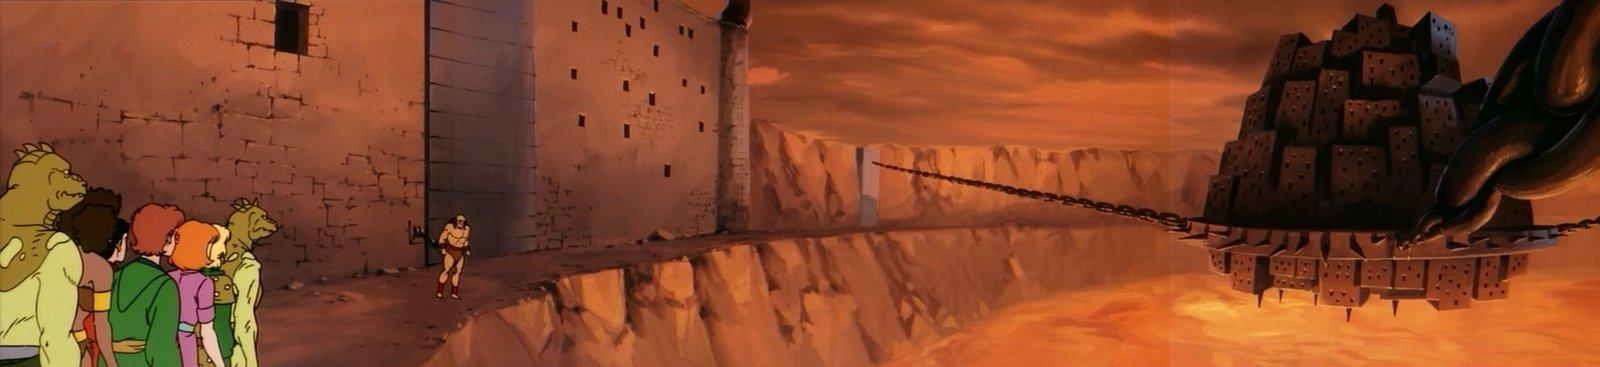 Agony prison panorama